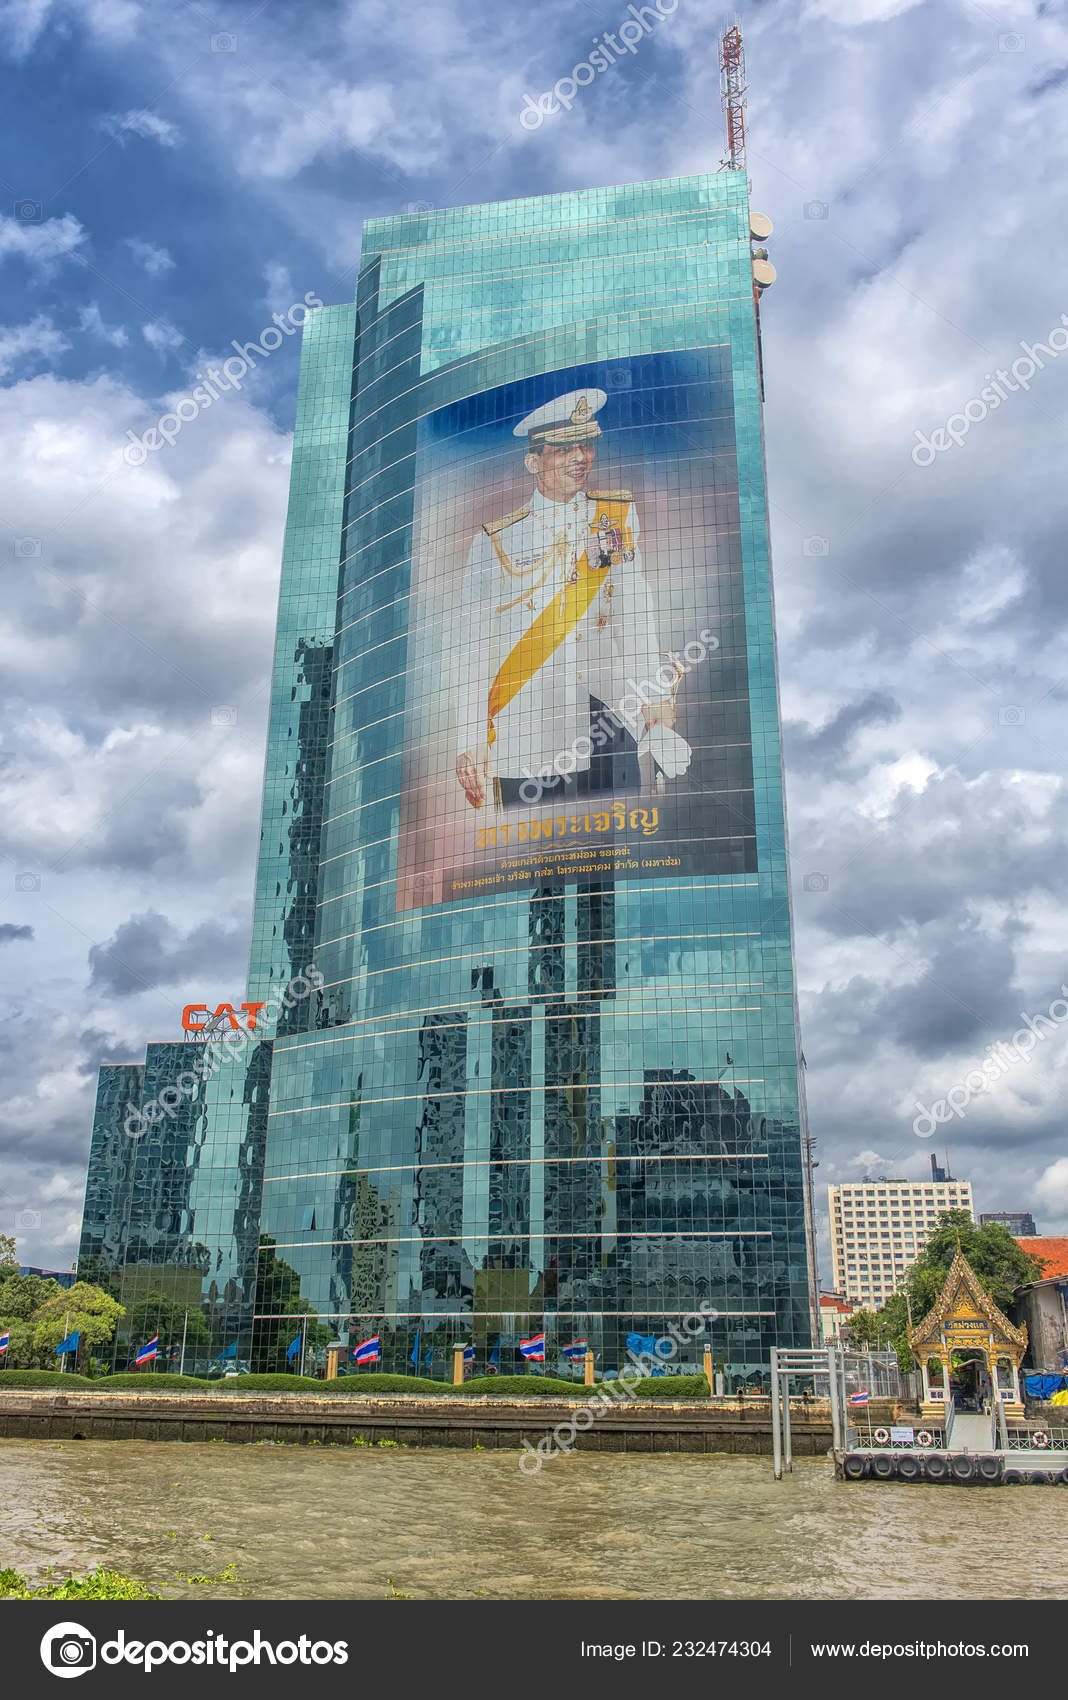 Bangkok Thailand 2018 New Thai King Giant Image Glass Facade – Stock